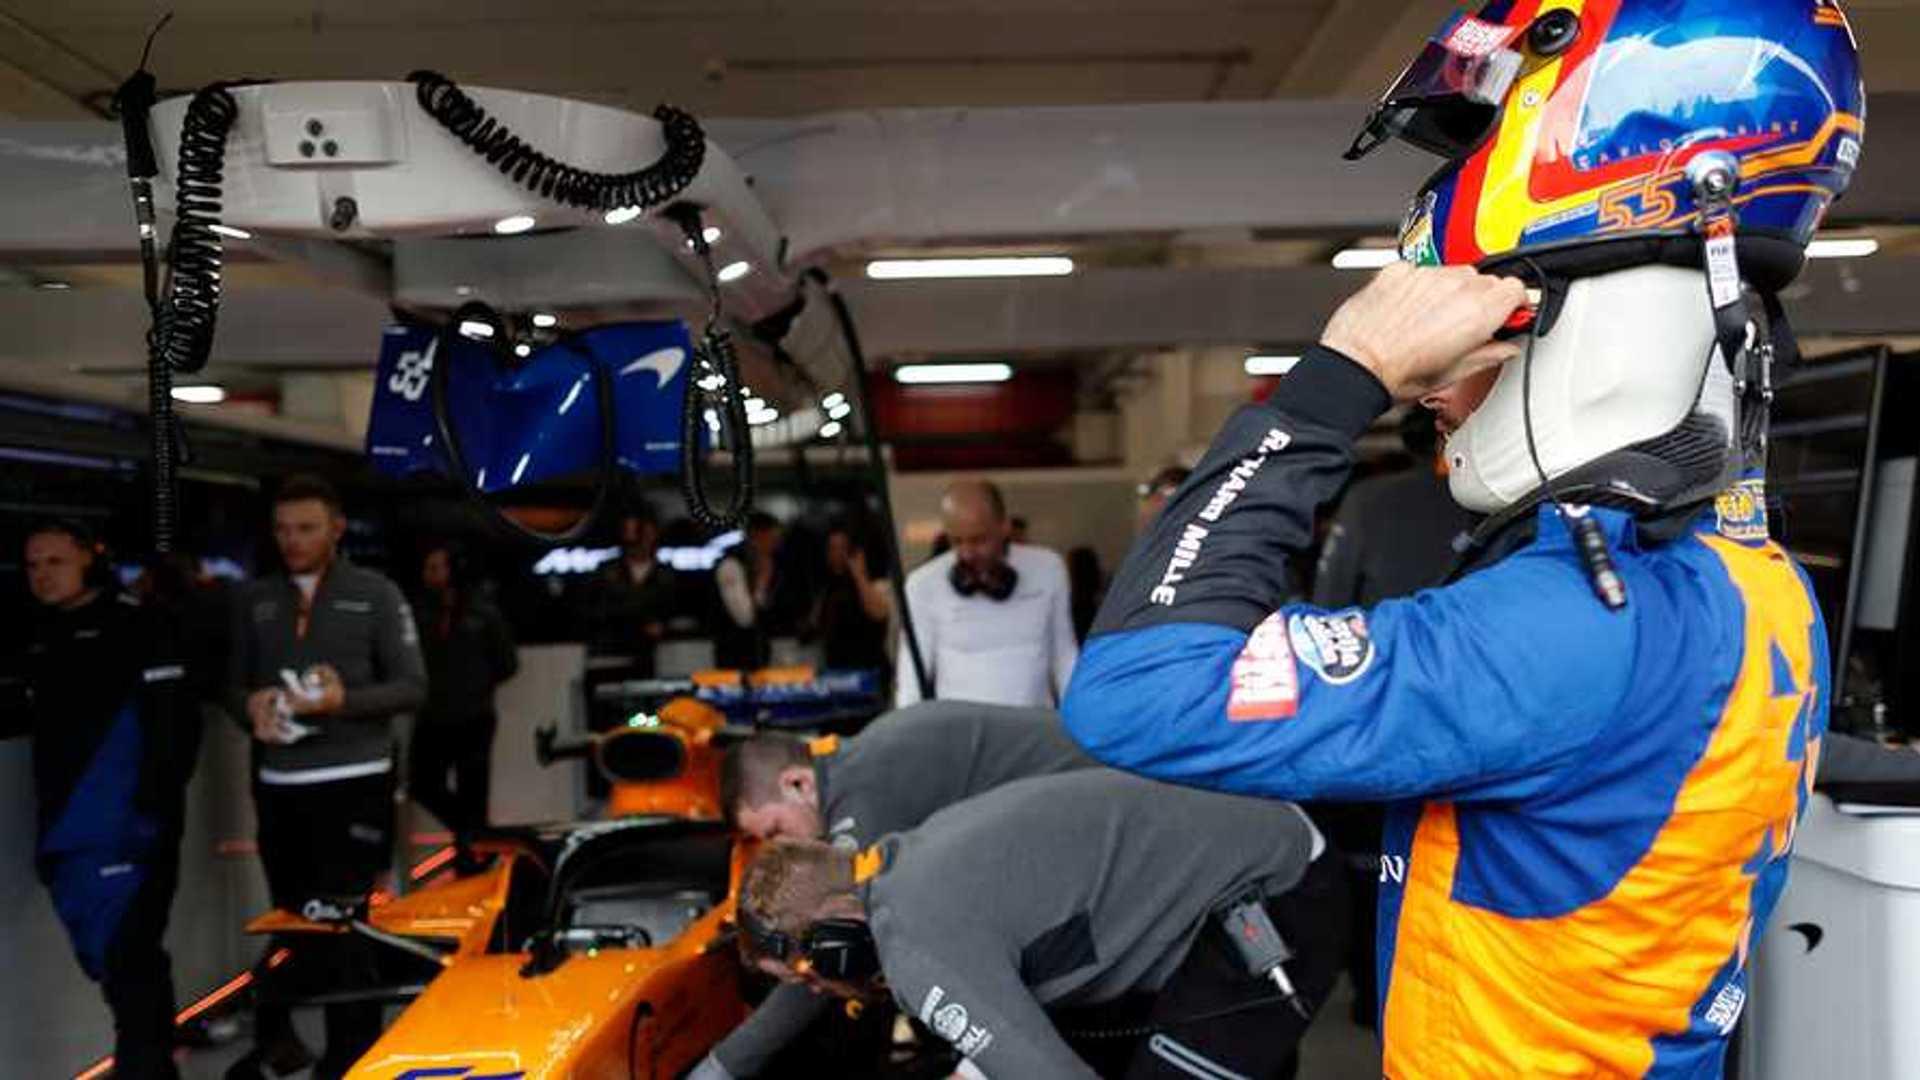 Three treated after McLaren garage fire in Barcelona